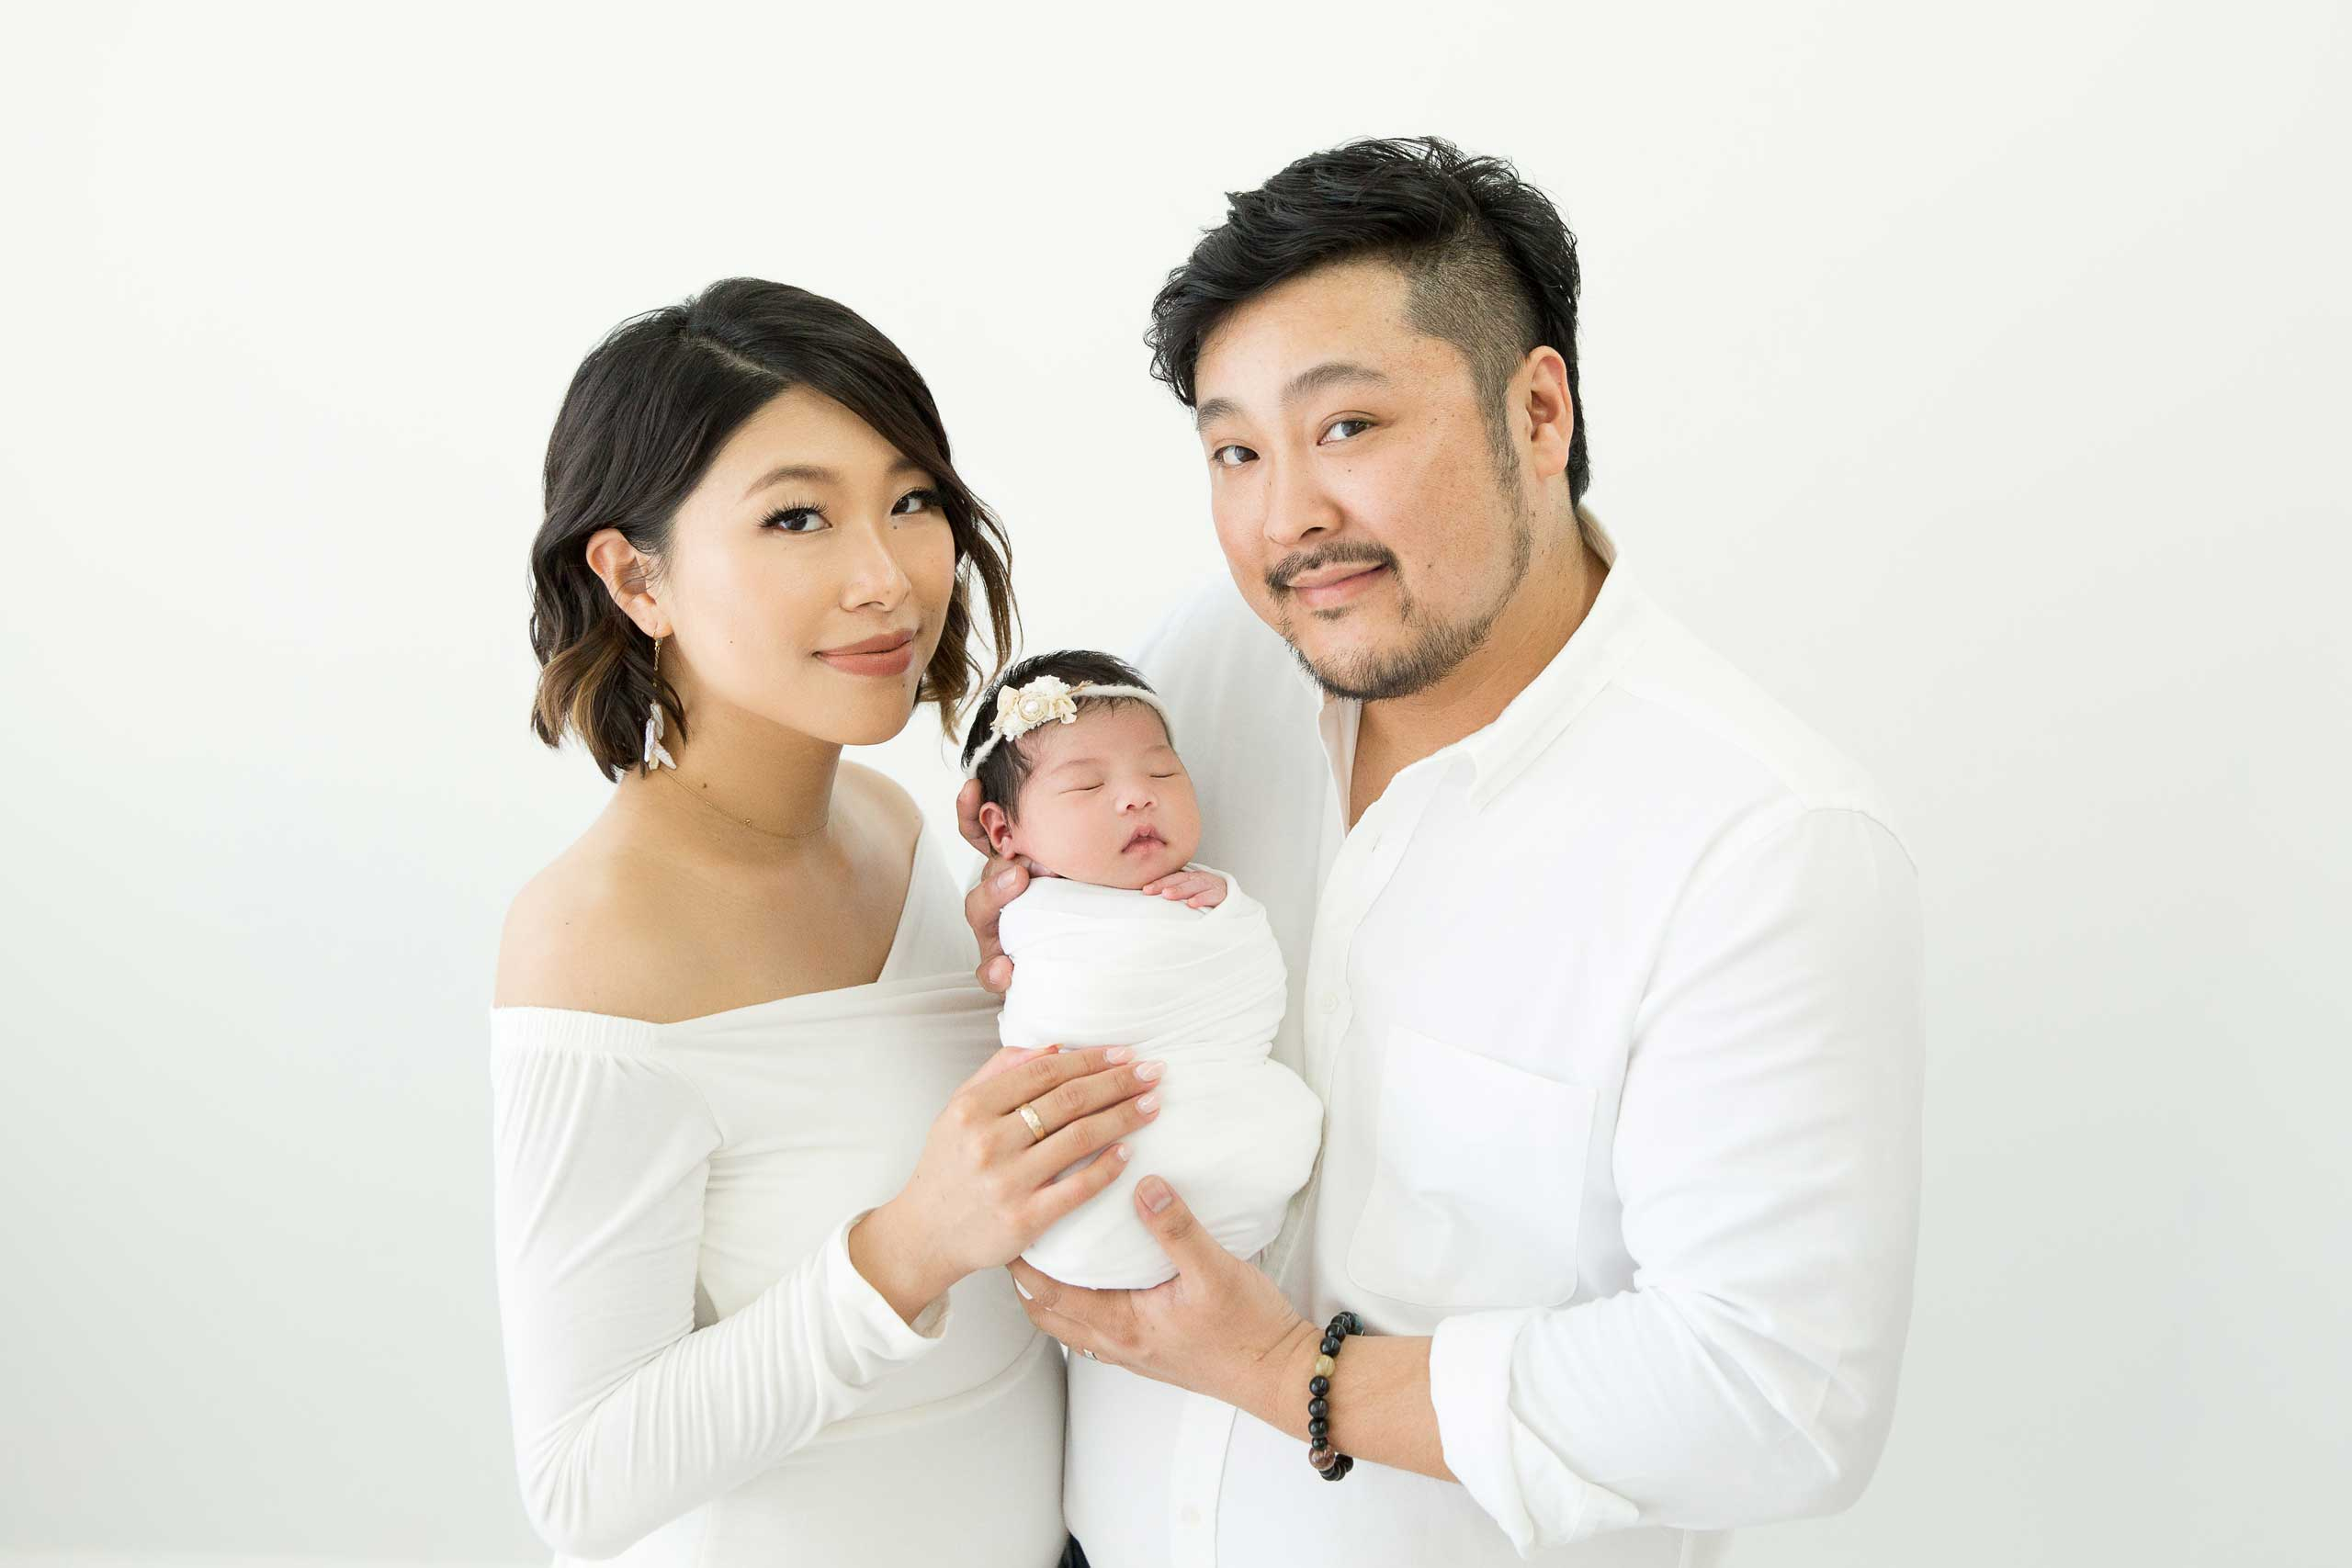 Ramina Magid Newborn Baby Photoshoot Los Angeles 292033 1